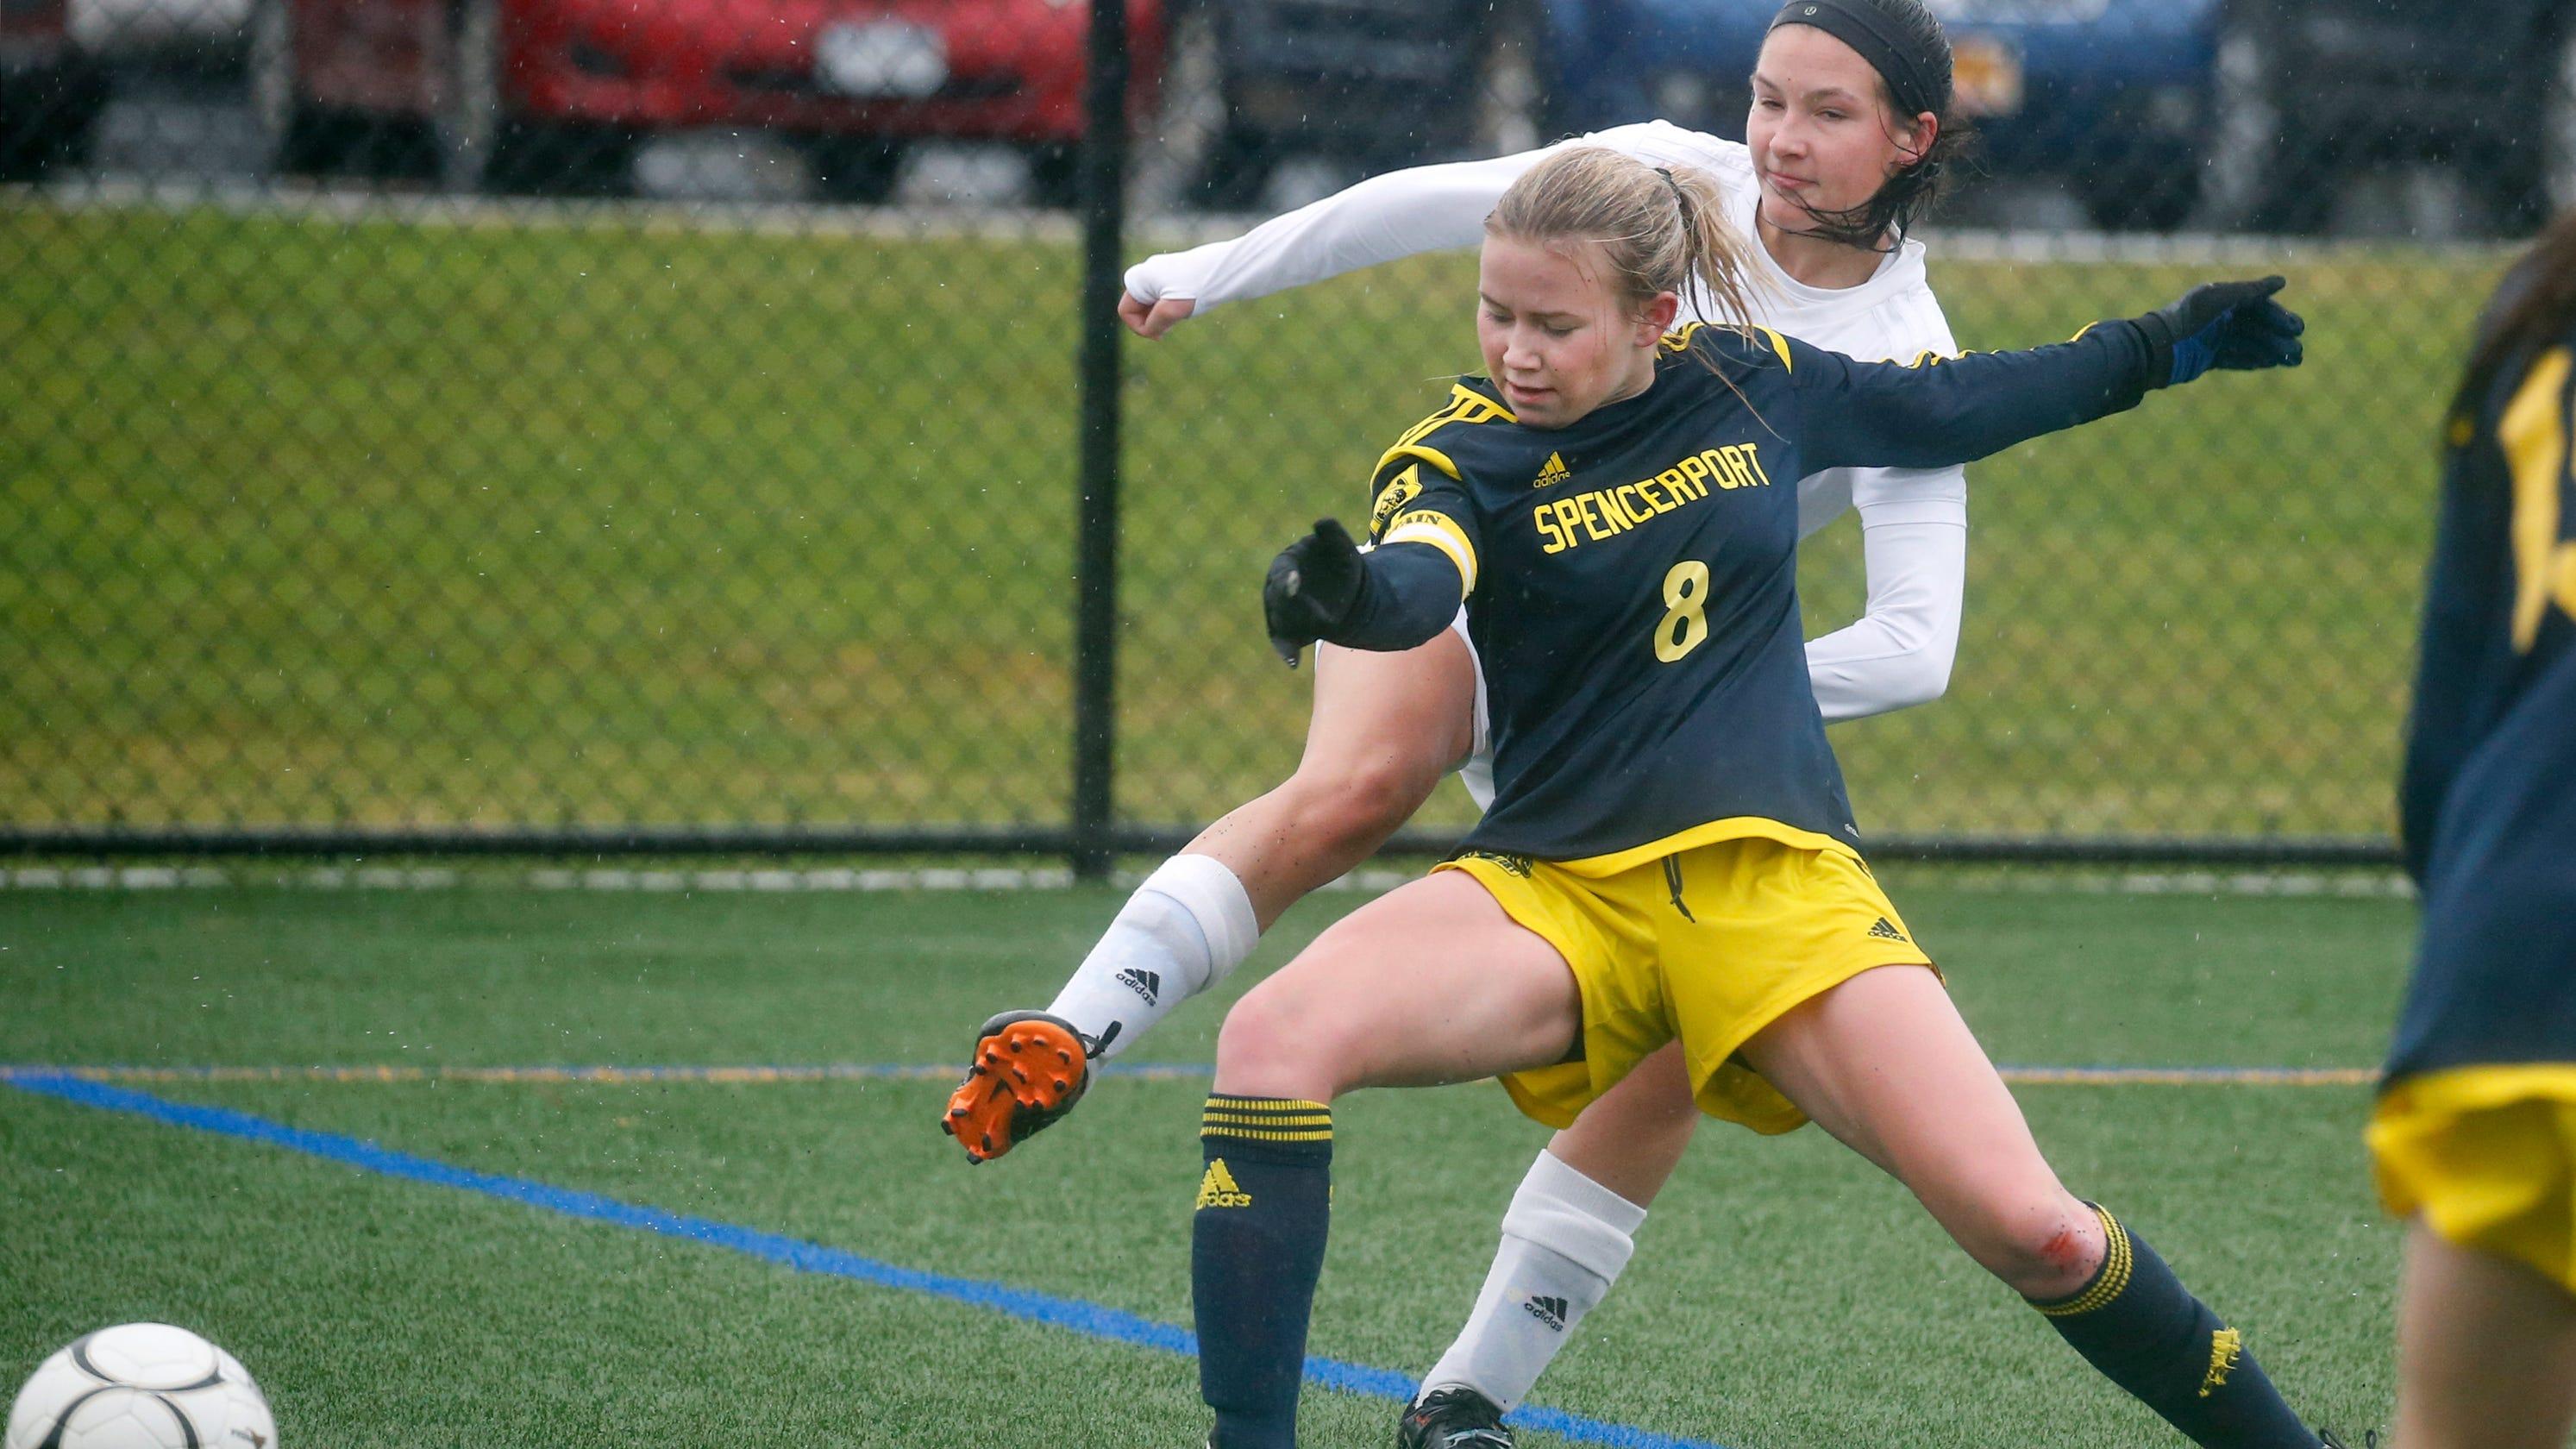 ee54304b729f State girls soccer quarterfinals  Spencerport rolls over Amherst